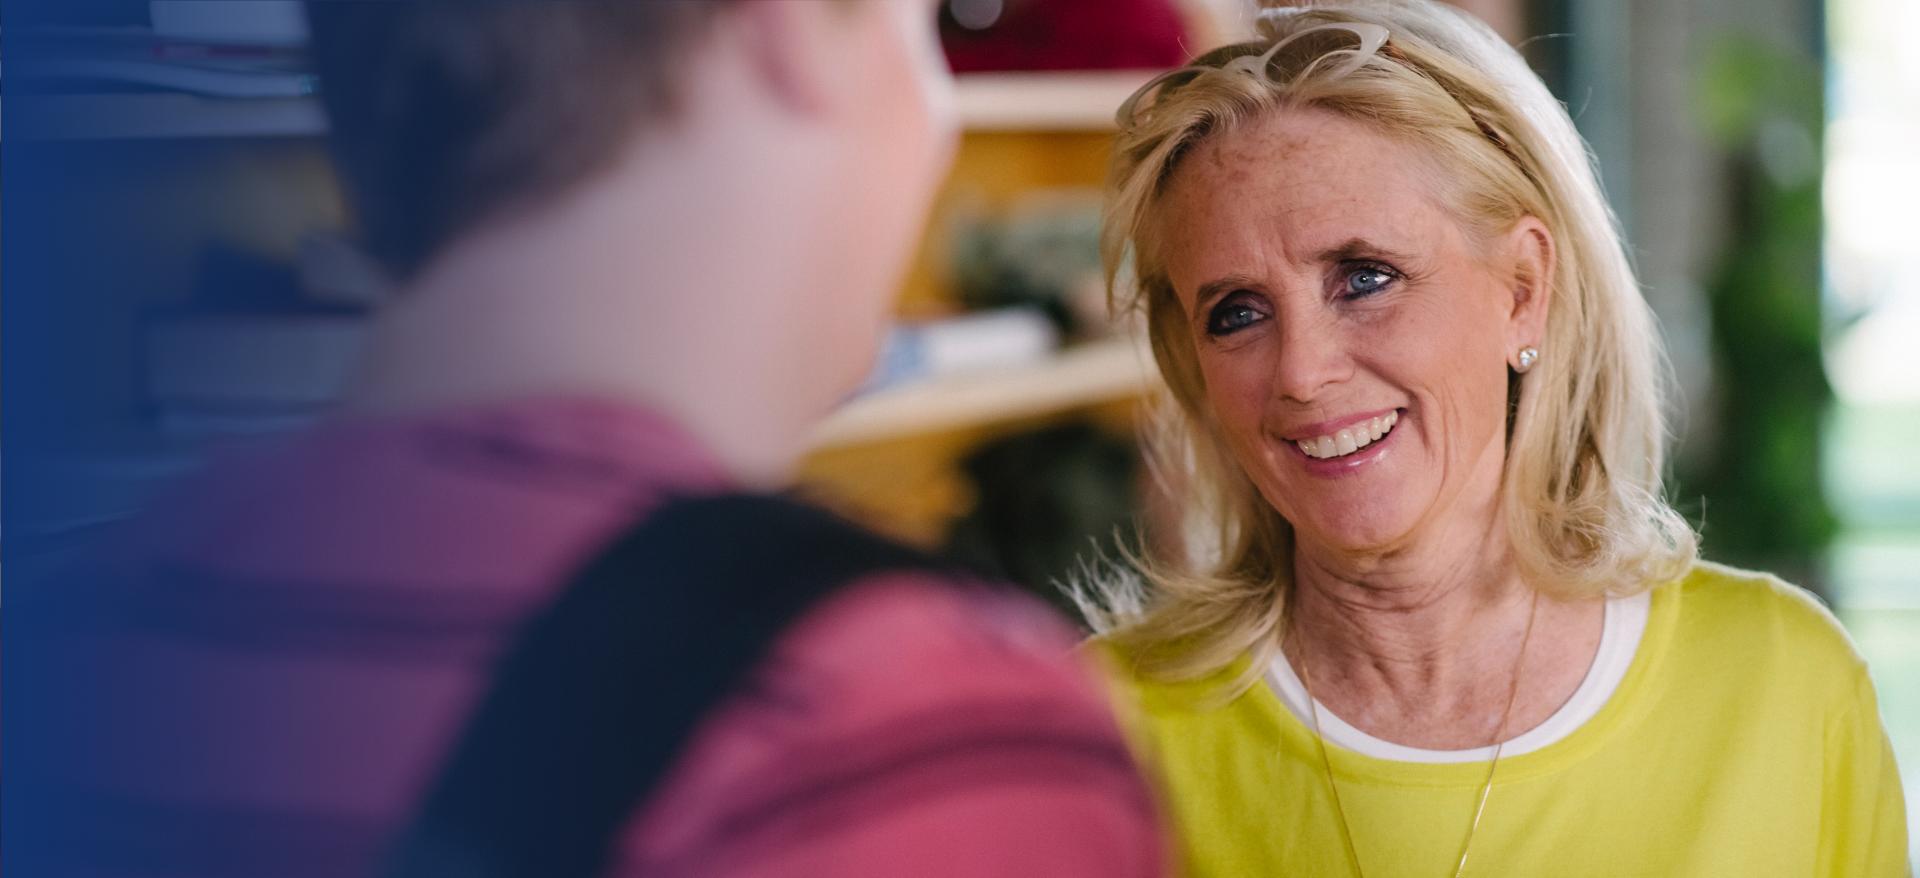 Debbie speaking to student